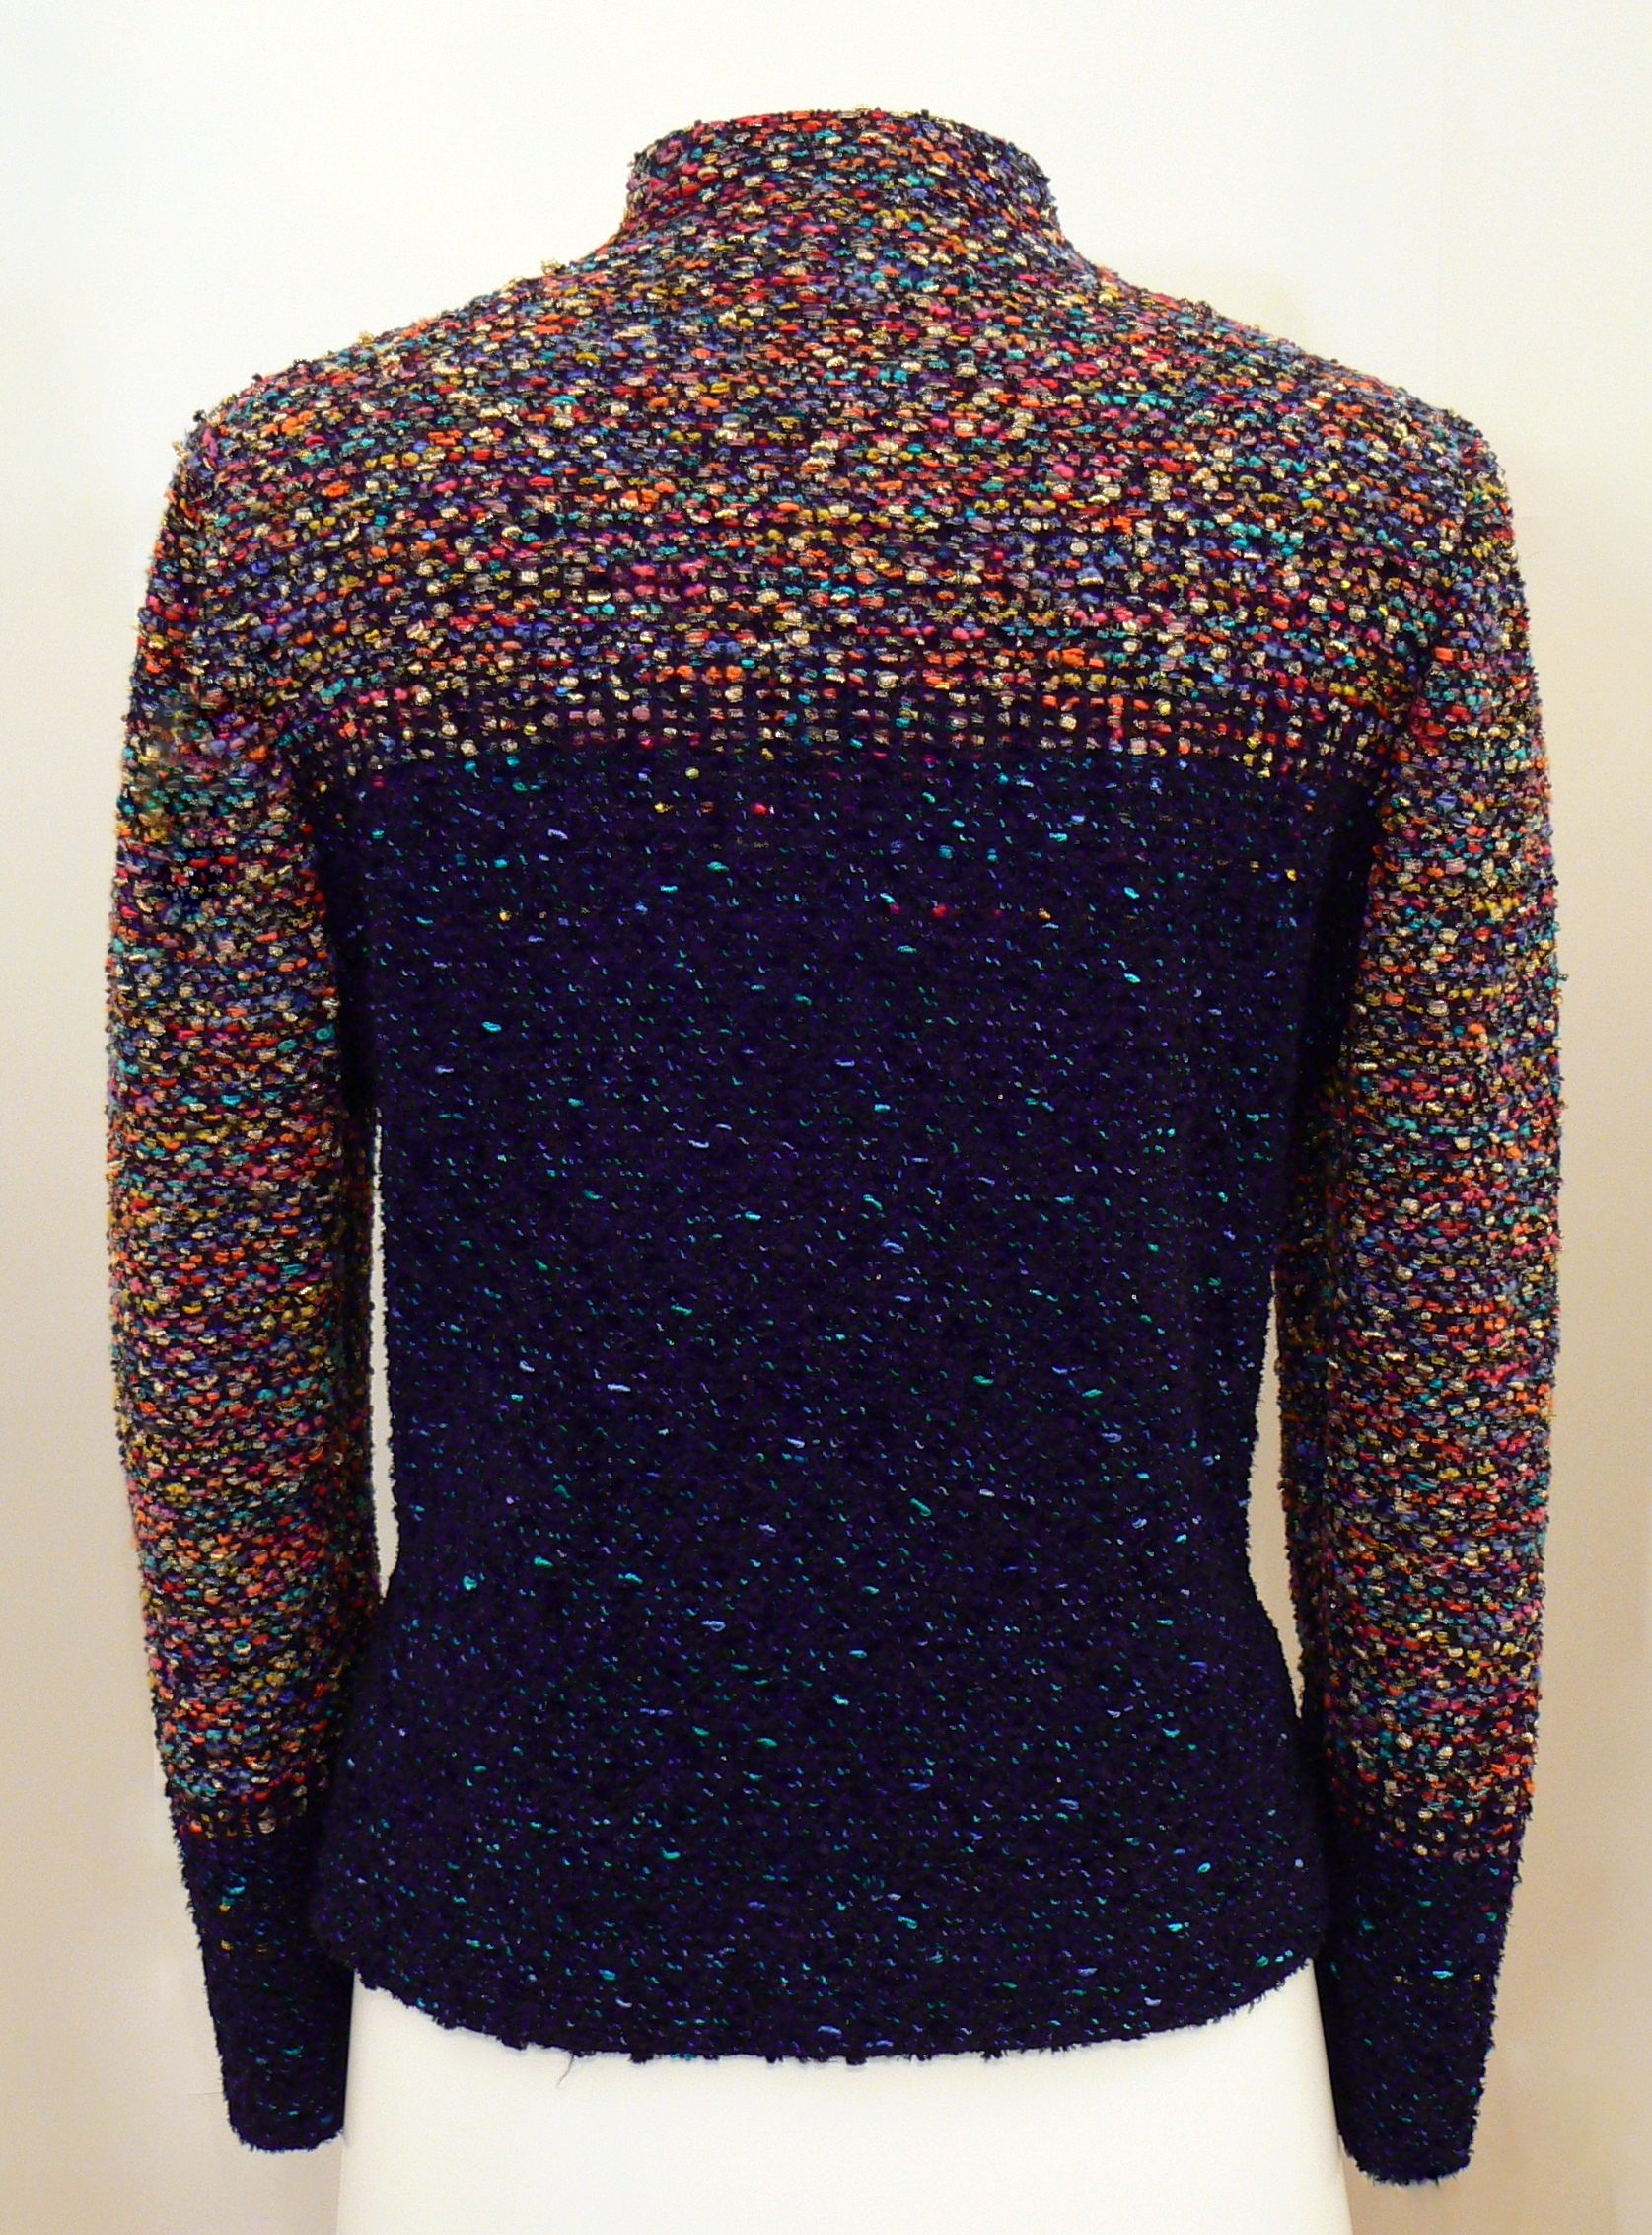 Handwoven Clothing, Jacket, Kathleen Weir-West, 22-001.JPG